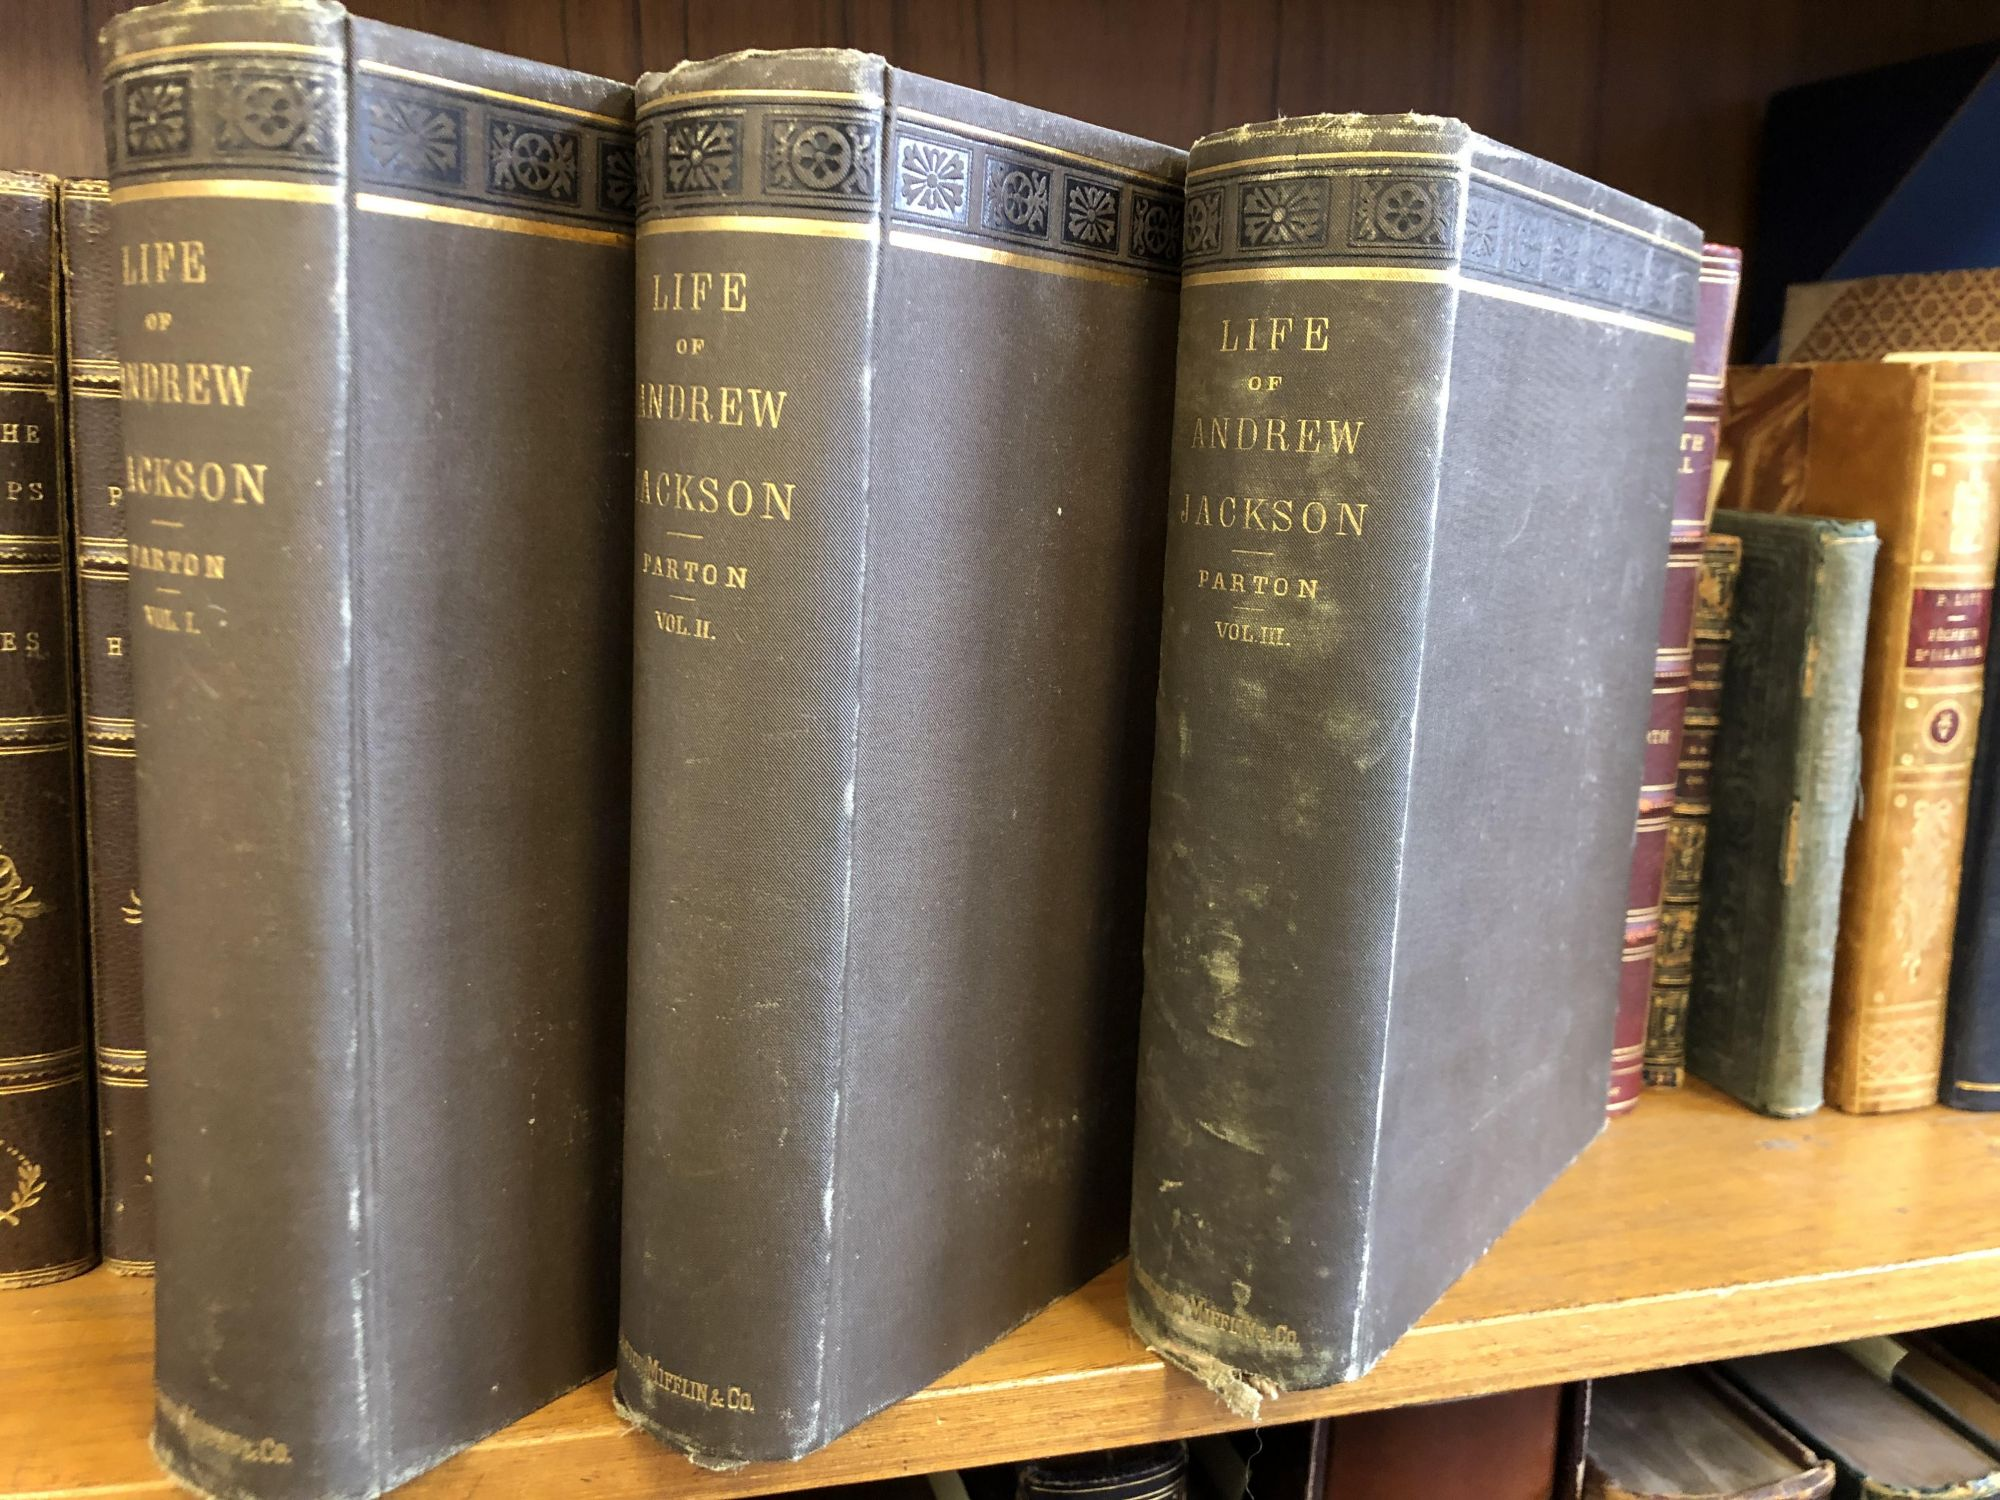 Life of Andrew Jackson, 3 Vols. book image